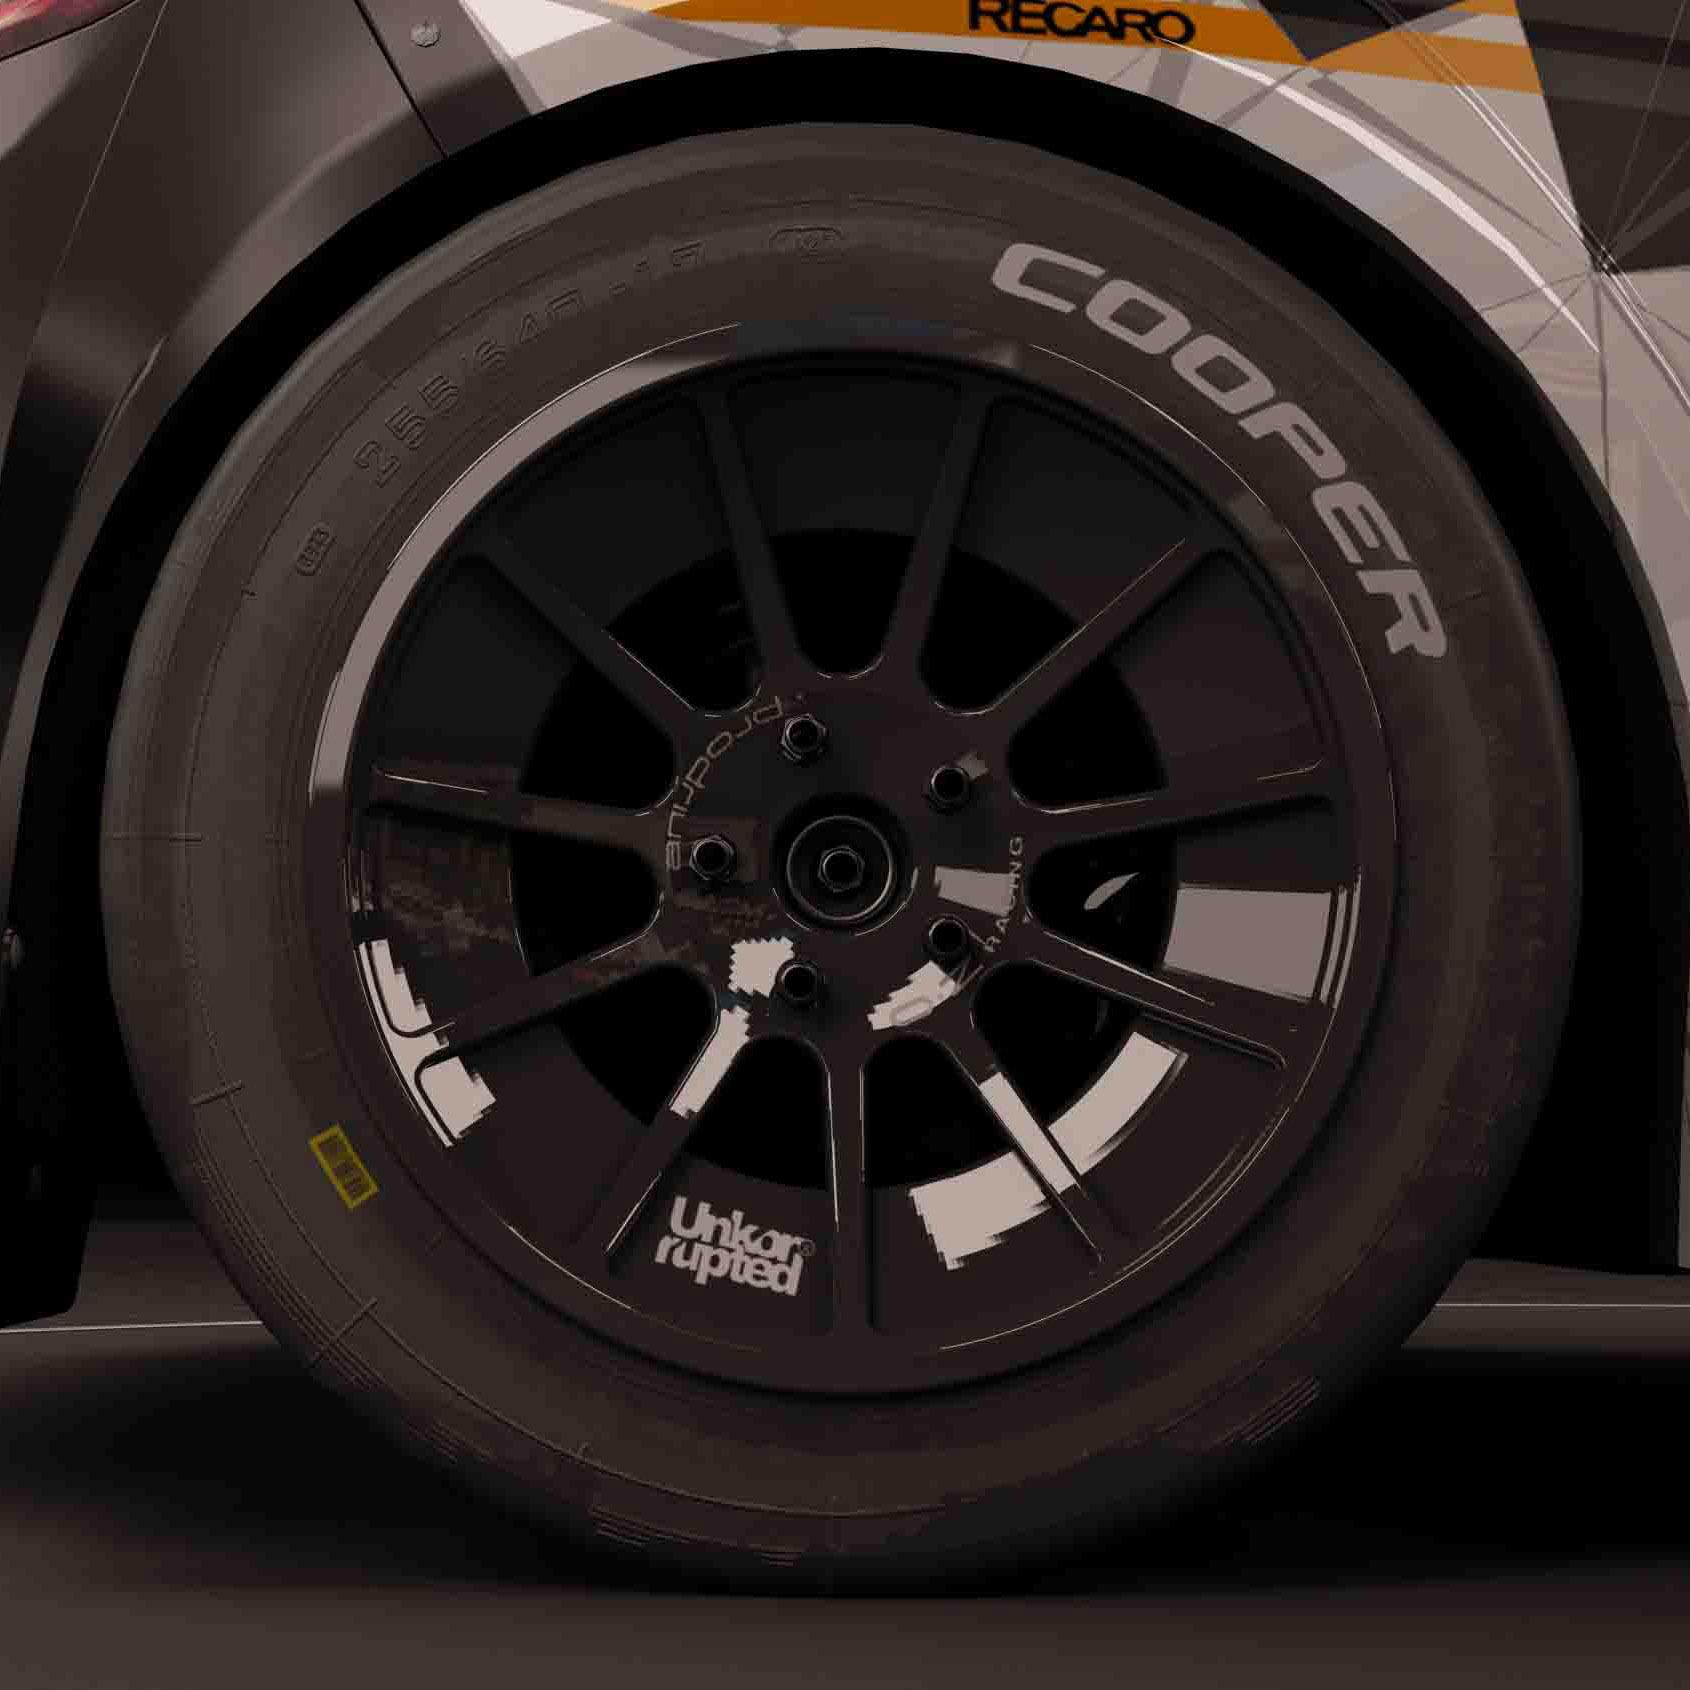 Renault Megane FIA World Rallycross AMD 01 a